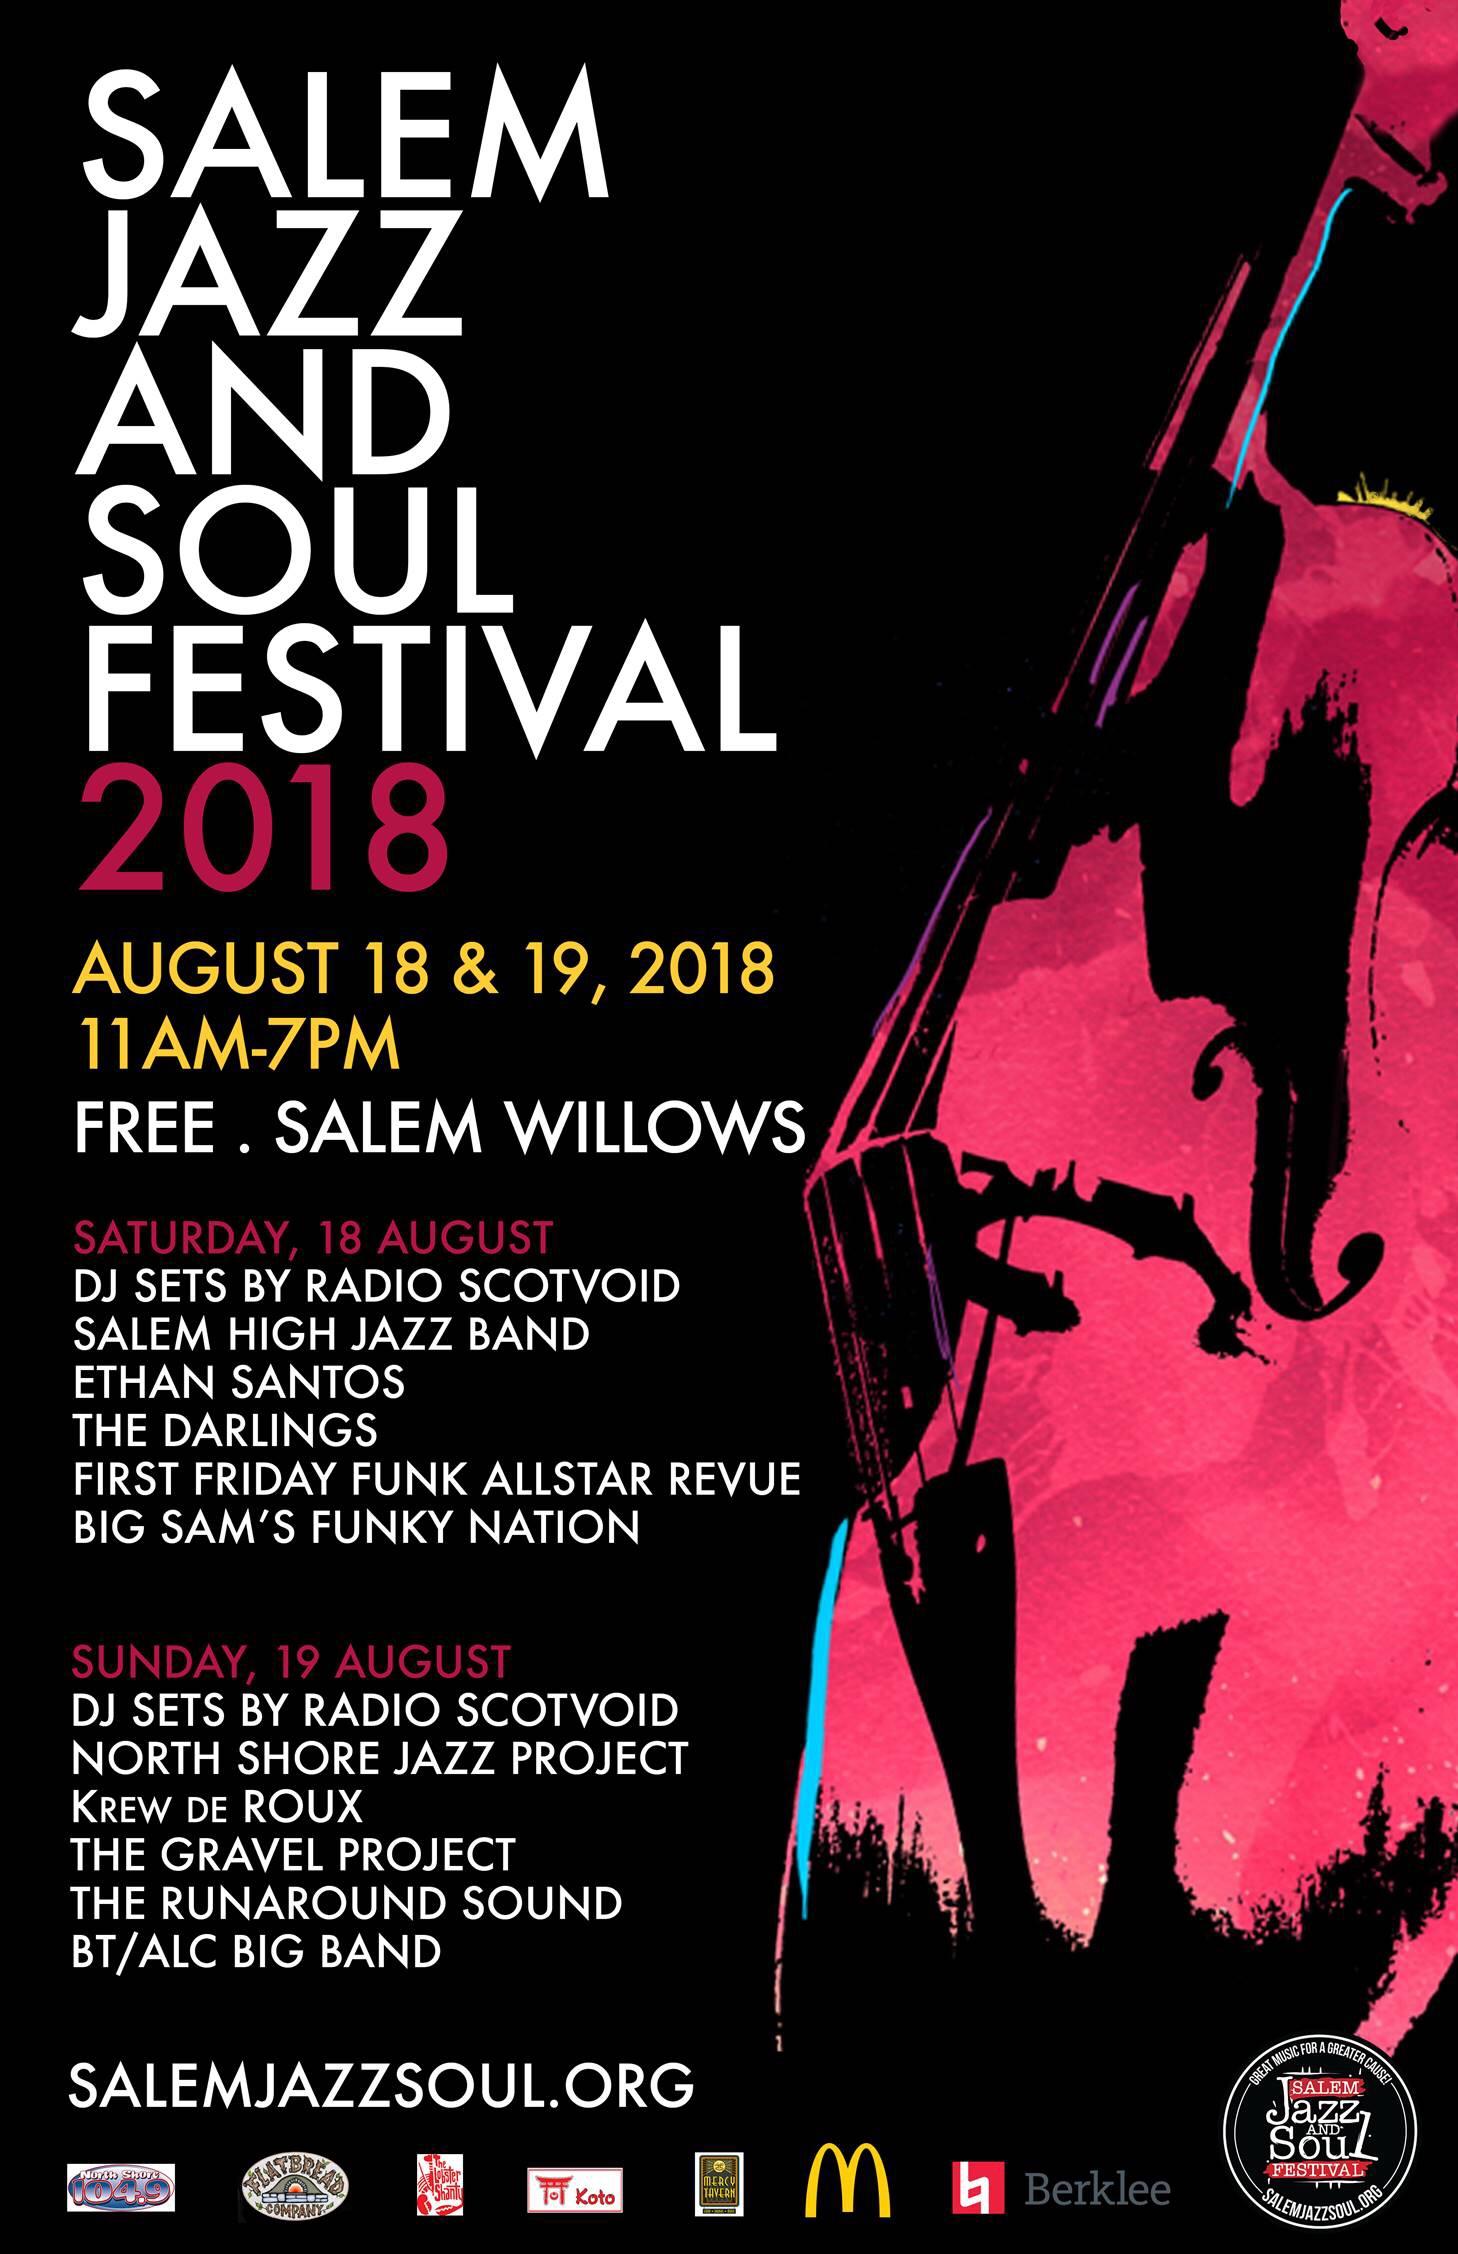 2018 Salem Jazz And Soul Festival Schedule Of Events Salem Jazz